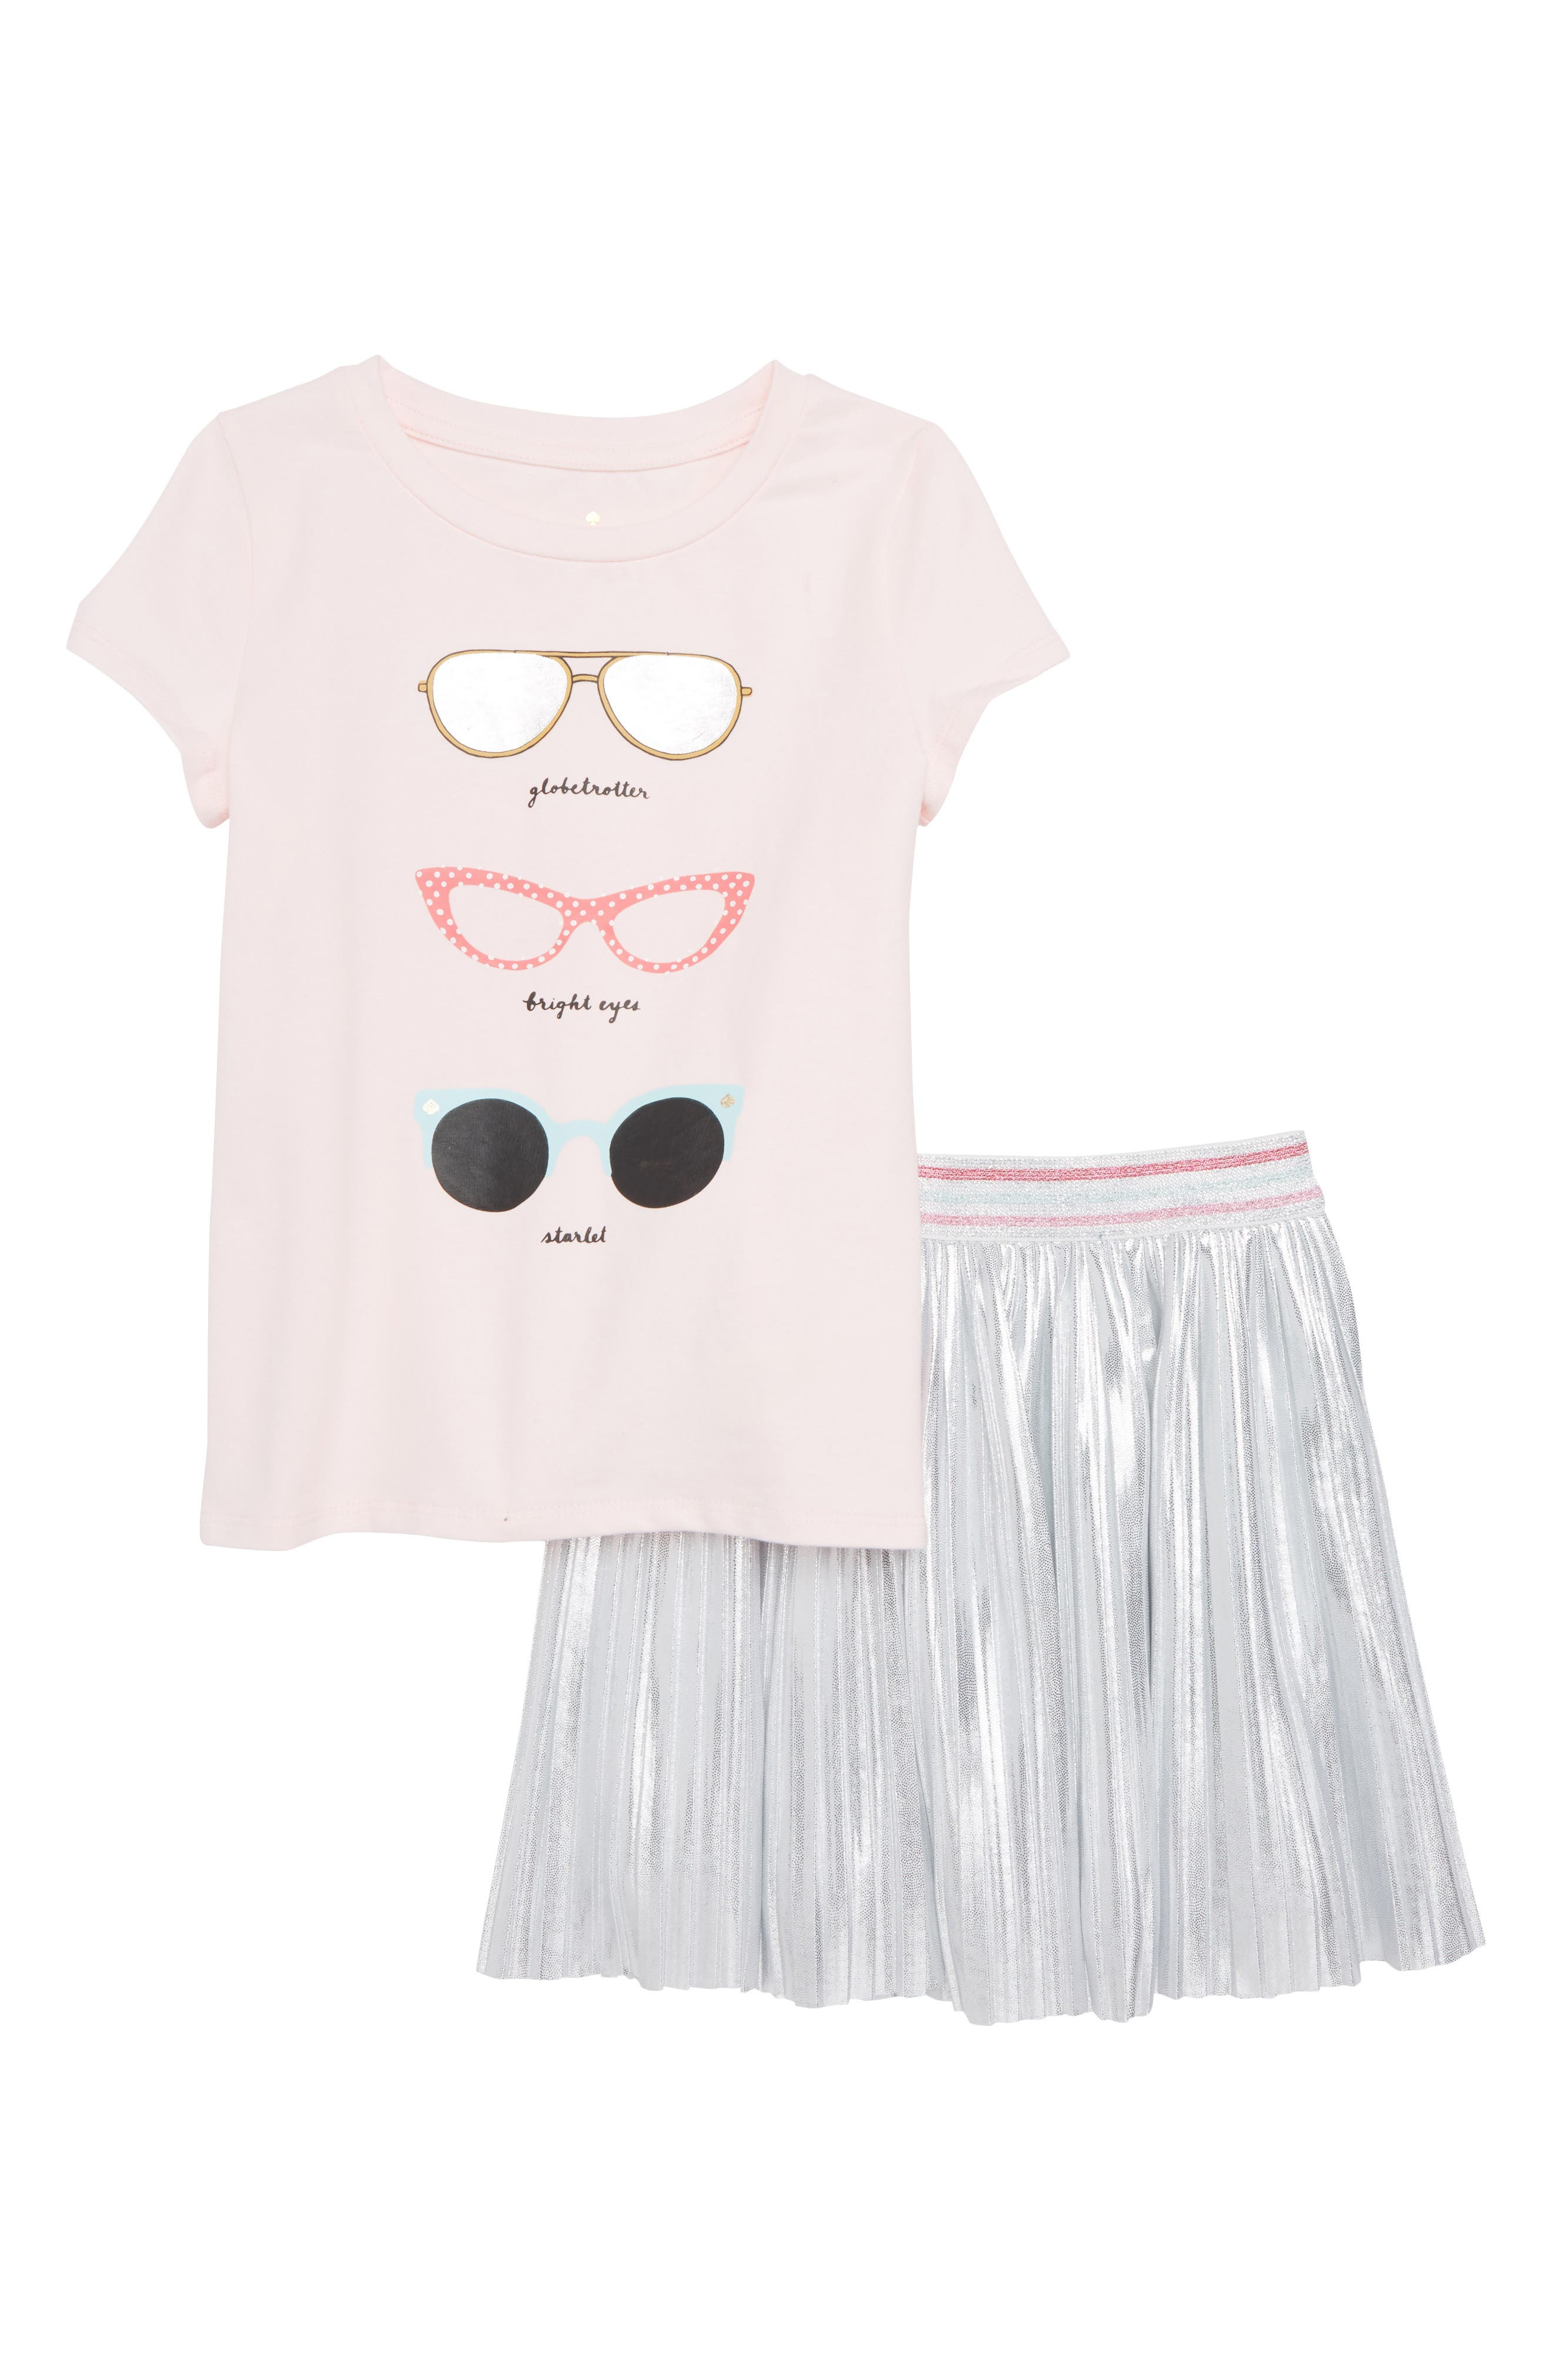 KATE SPADE NEW YORK,                             graphic tee & skirt set,                             Main thumbnail 1, color,                             681